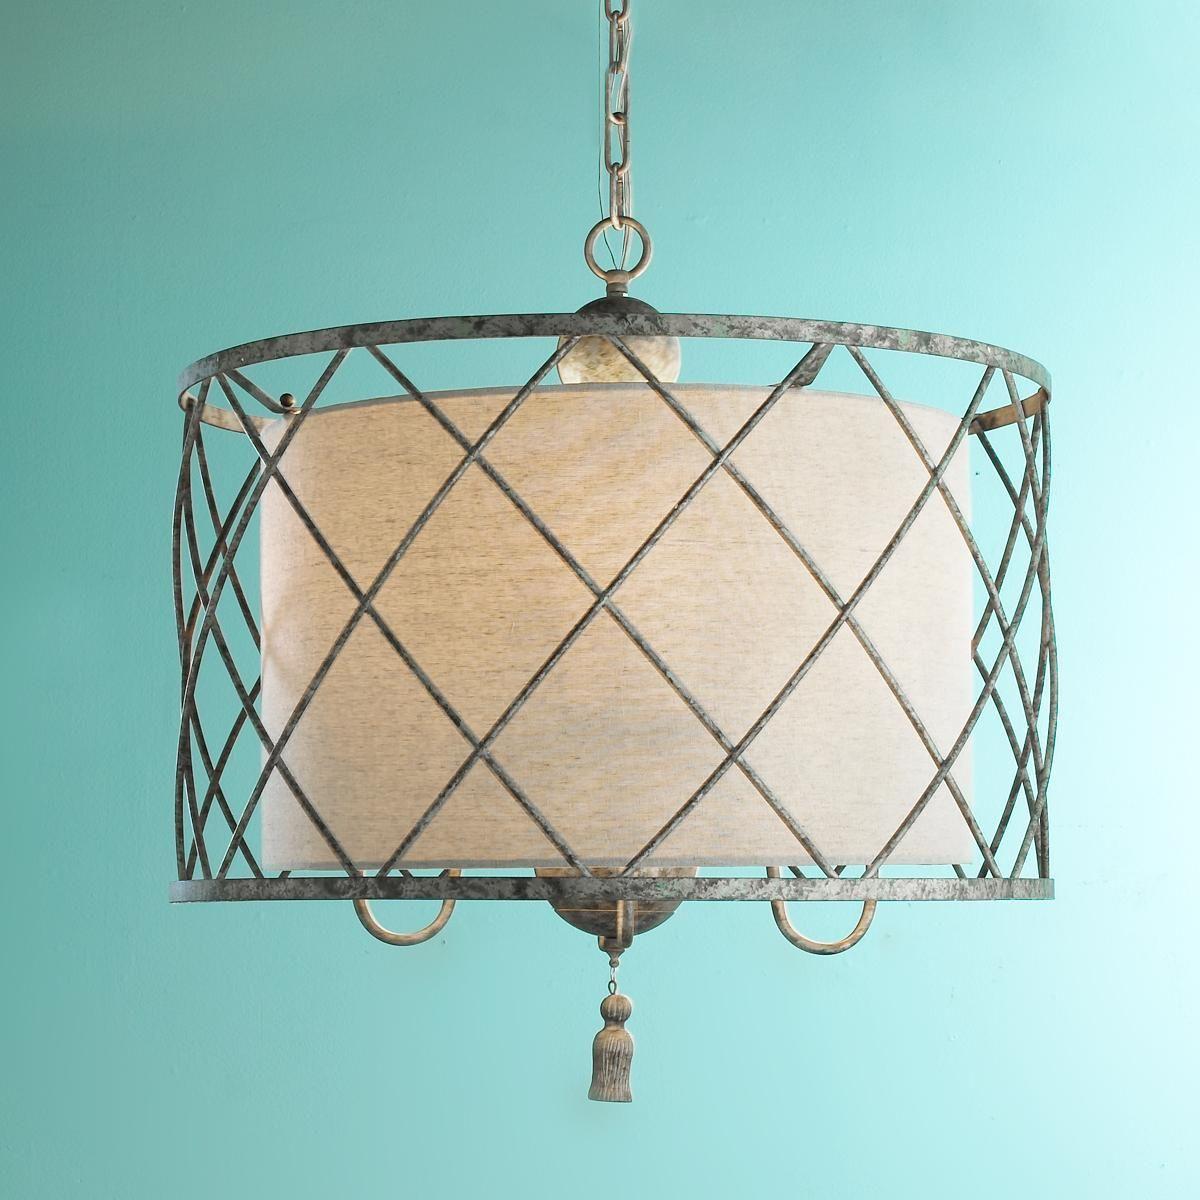 Large Drum Shade Pendant Light